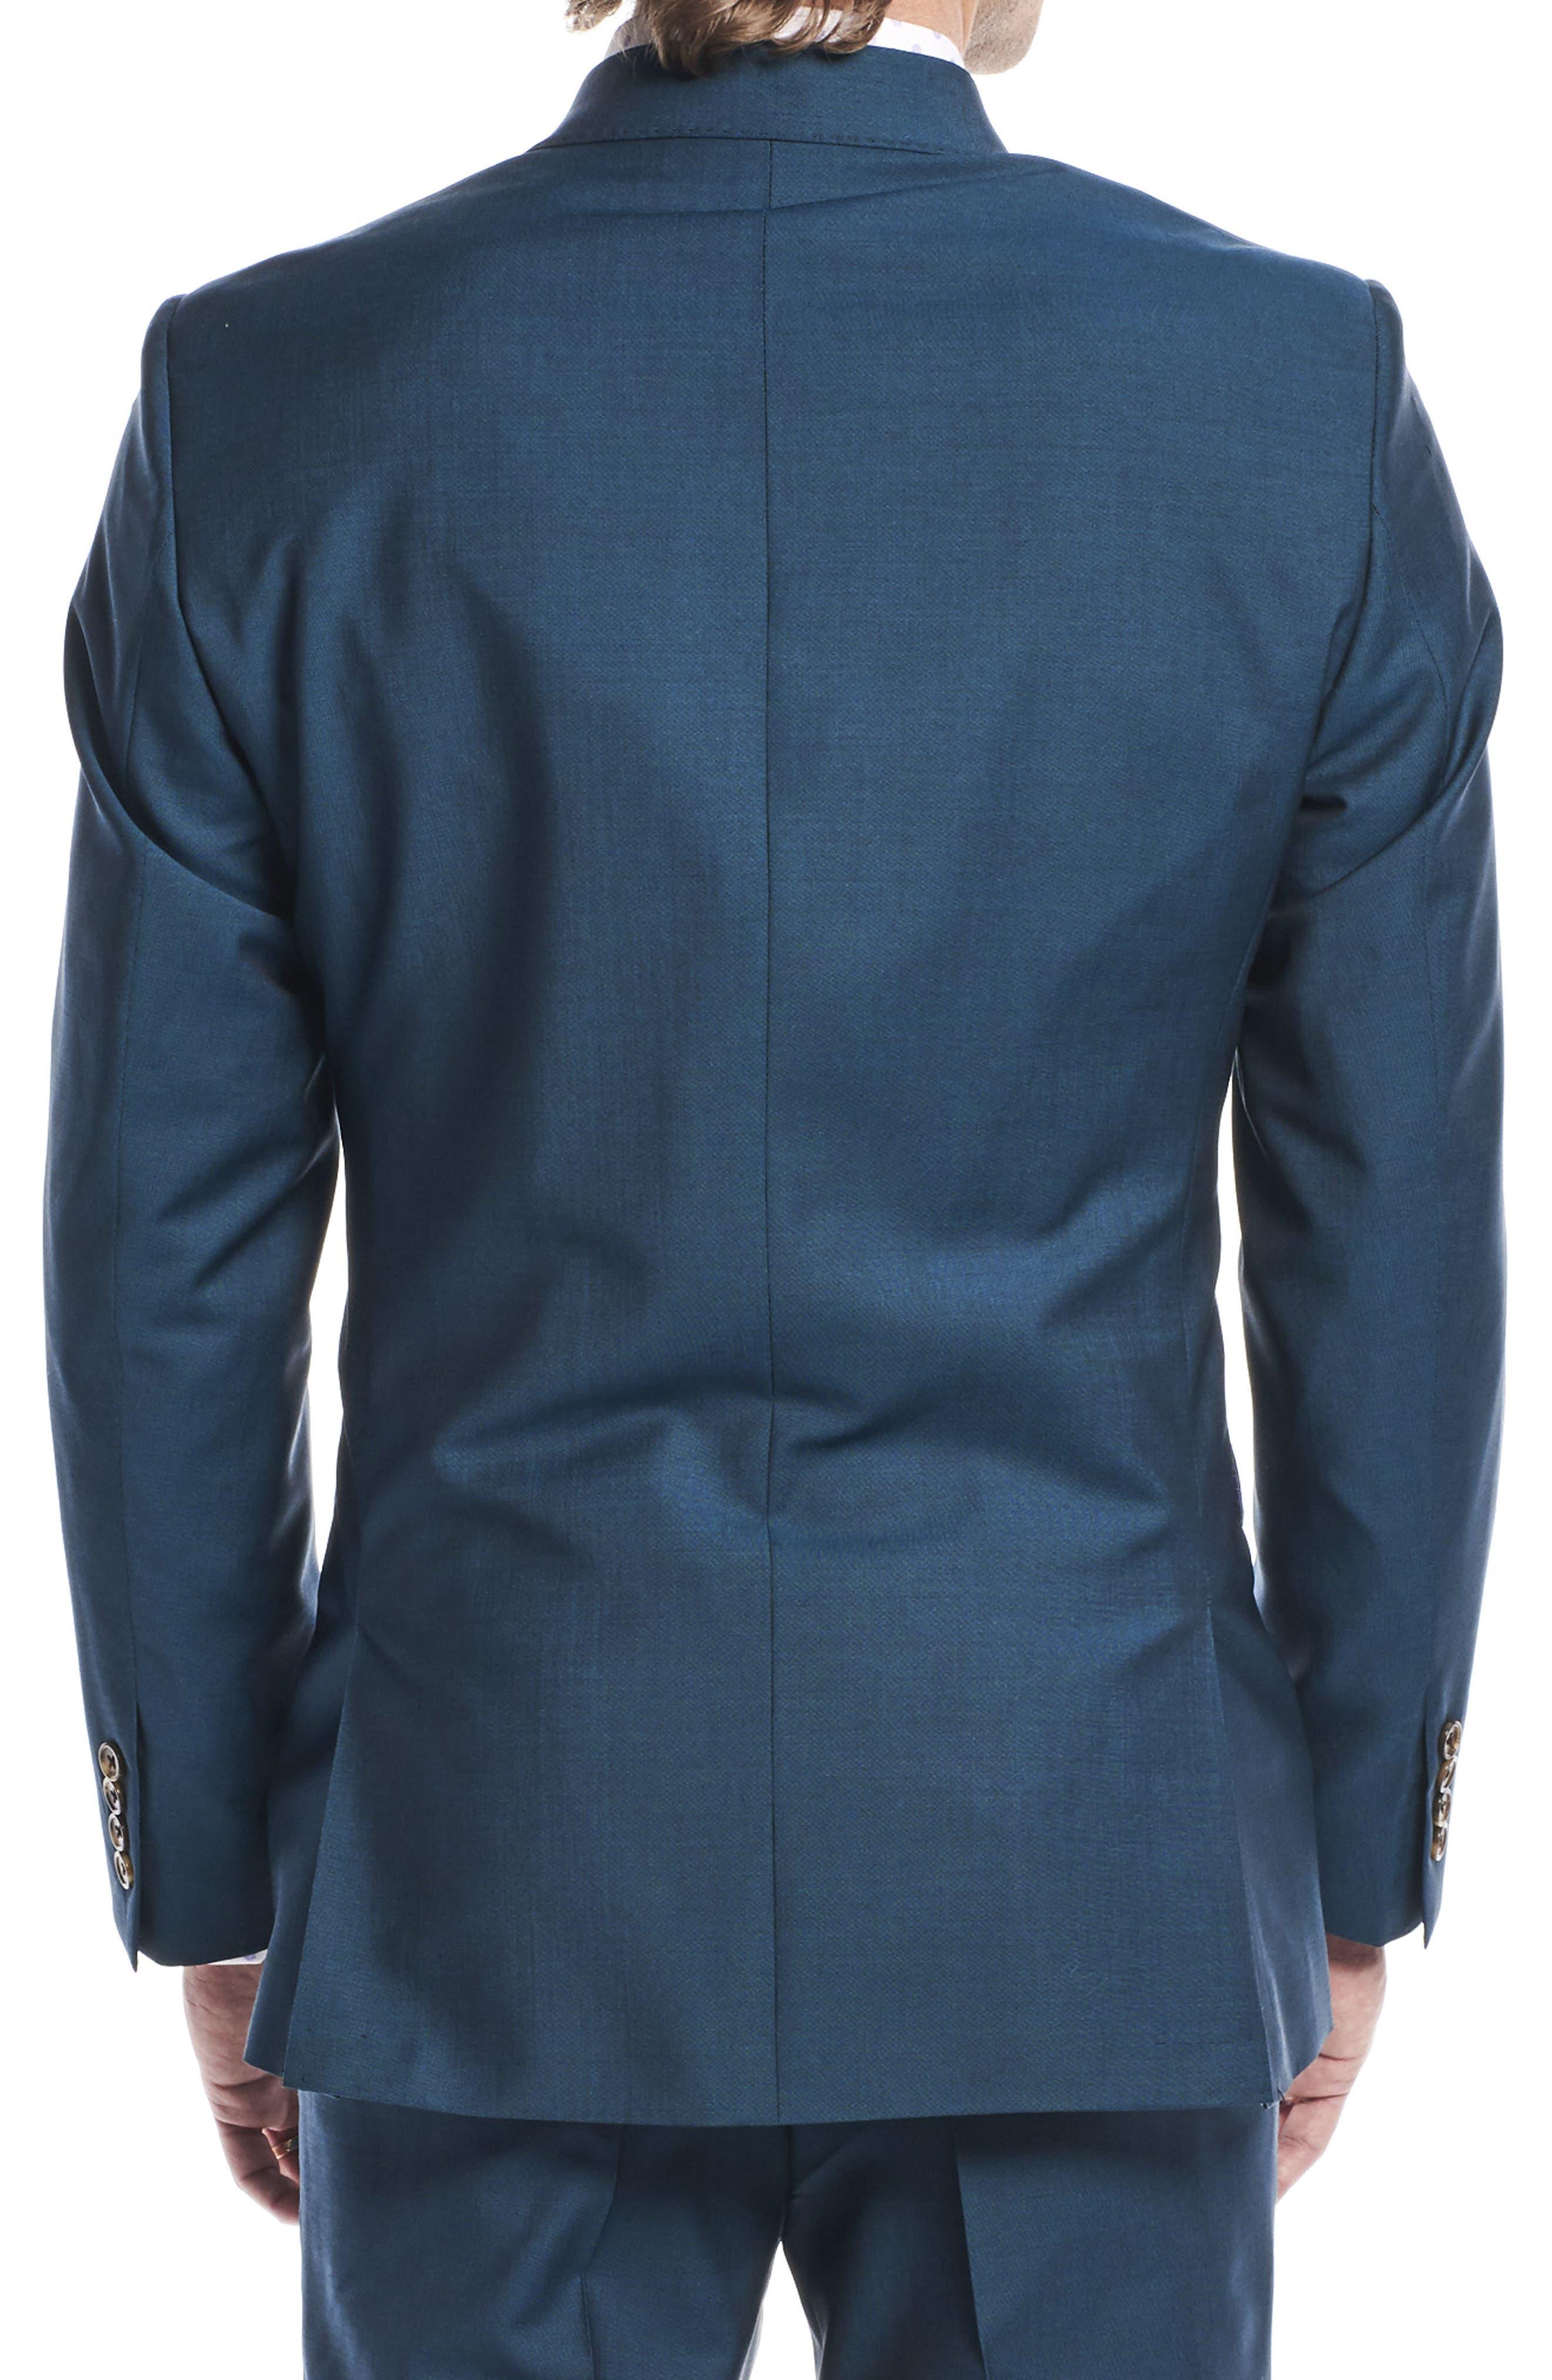 by Ilaria Urbinati Kilgore Slim Fit Solid Wool & Mohair Suit,                             Alternate thumbnail 4, color,                             Blue Teal